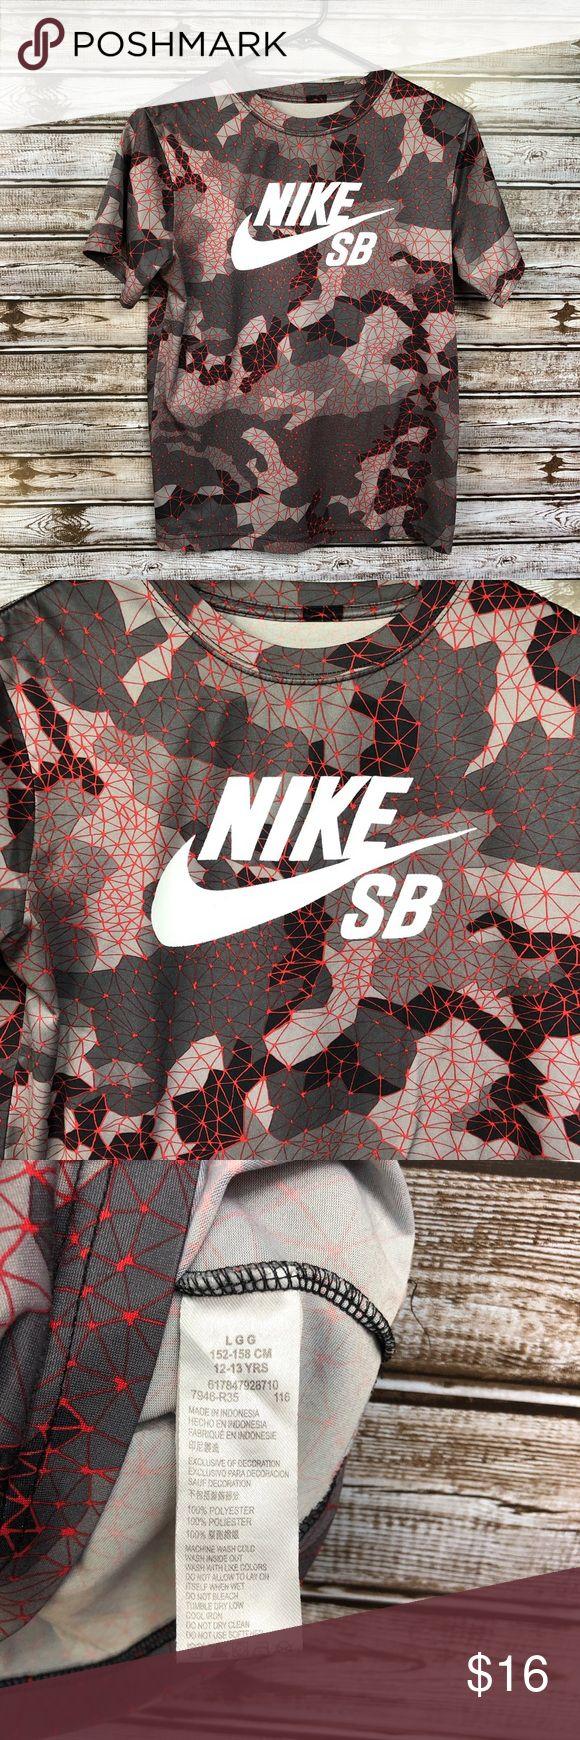 Nike SB Youth Boys Camo Red Short Sleeve T-Shirt Nike SB Youth Boys Camo Red Sho…